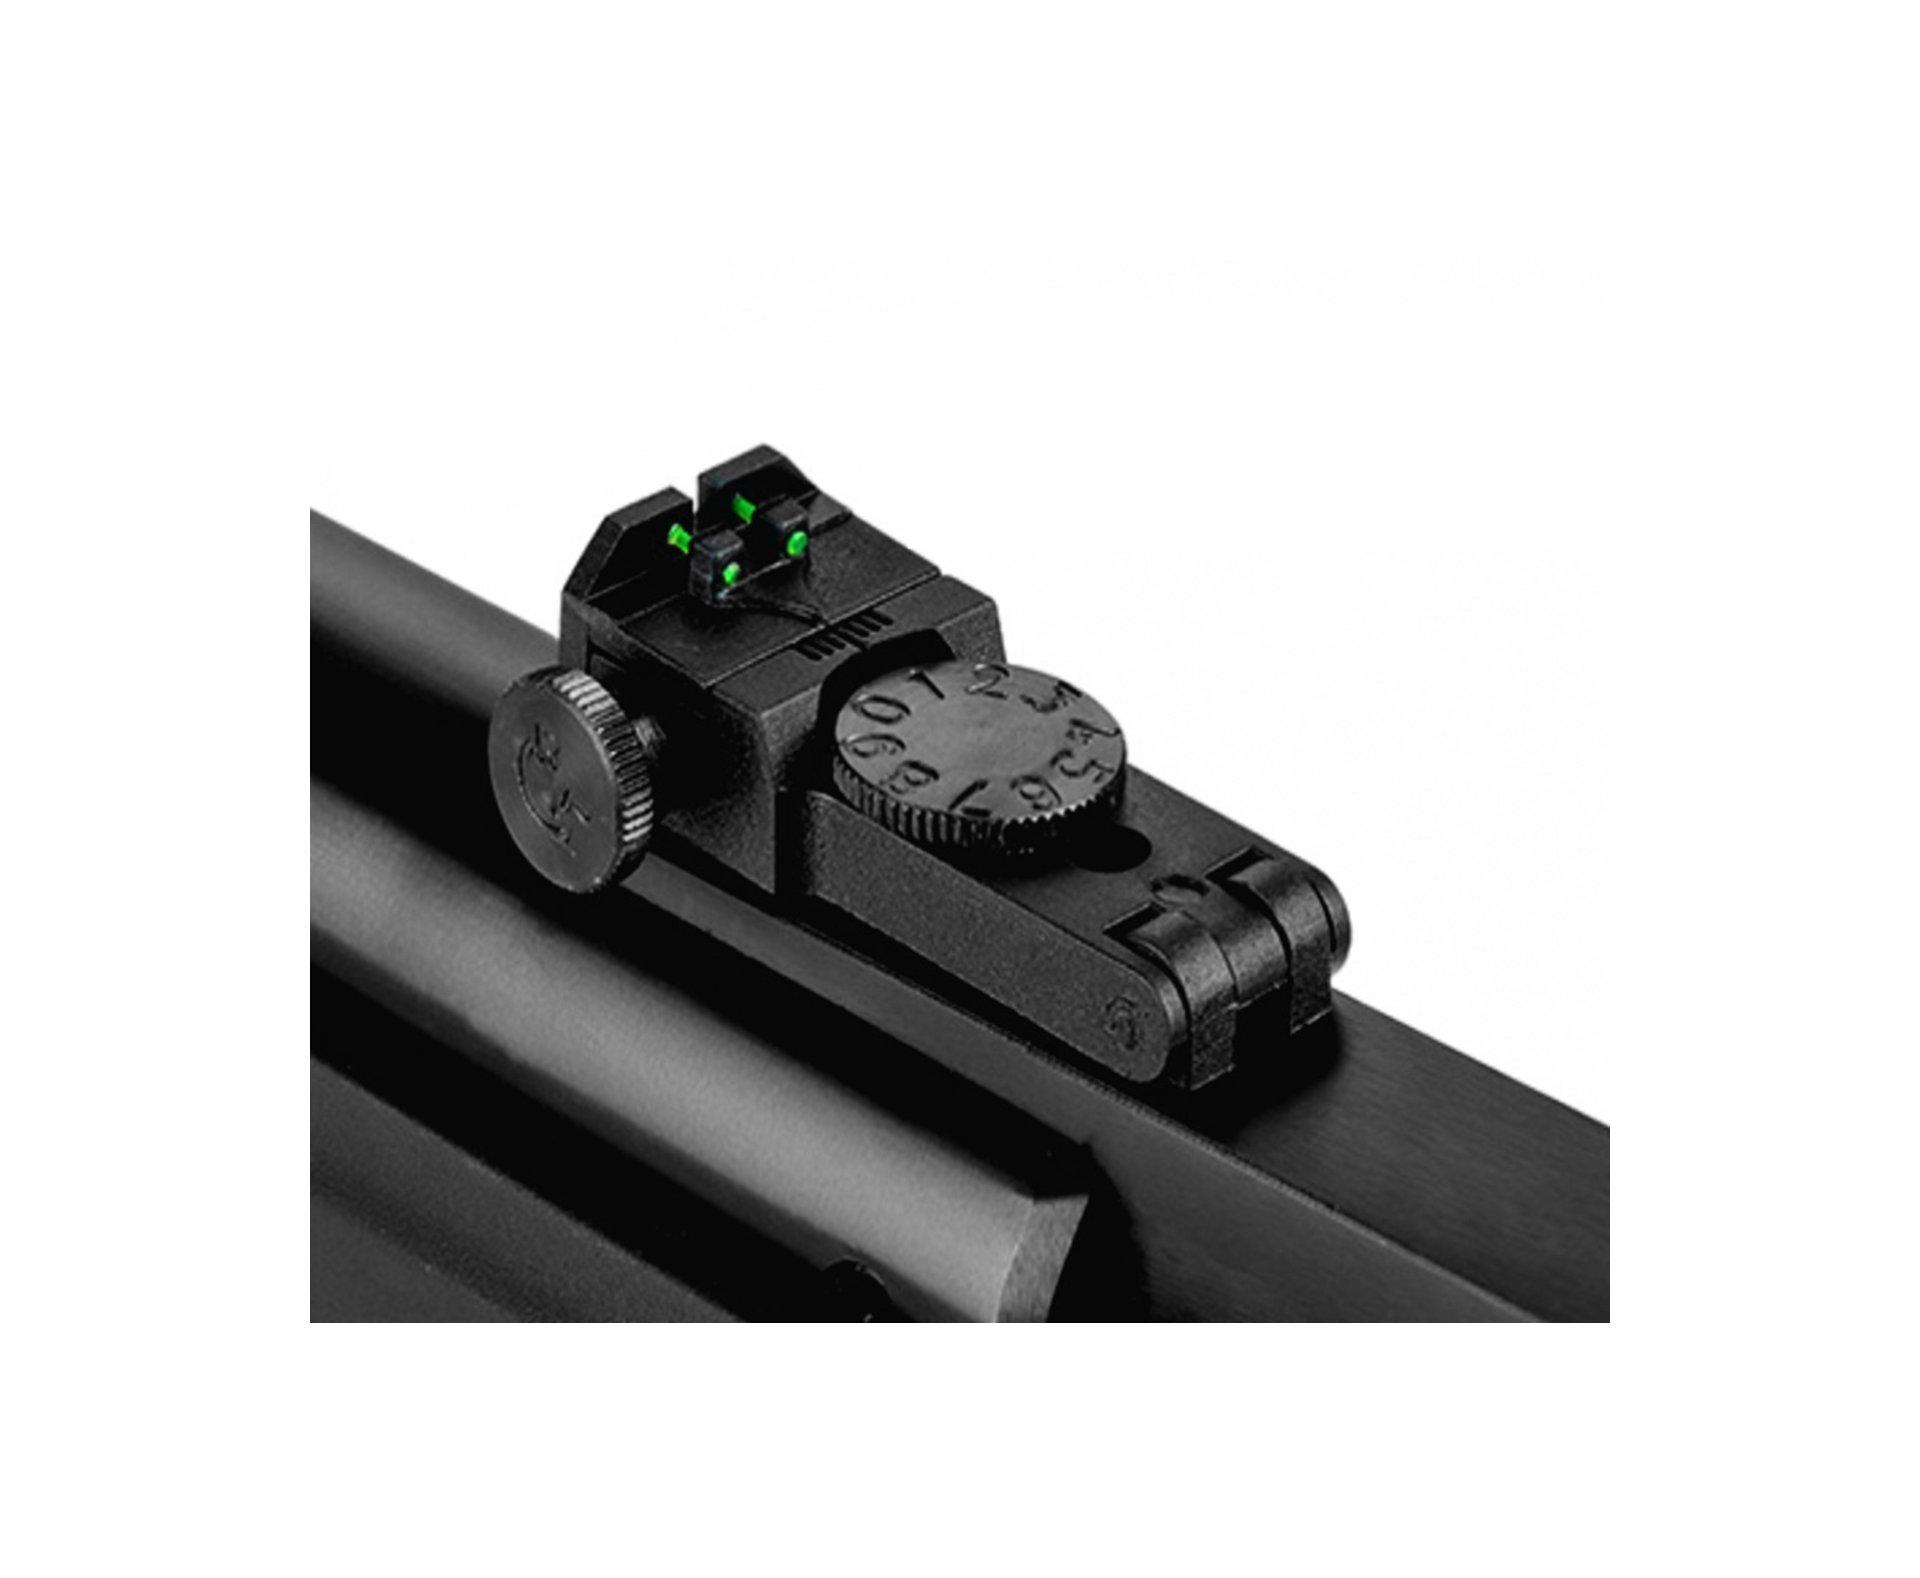 Carabina De Pressão Hatsan Striker Edge - Cal 4,5 Mm + Capa Rossi